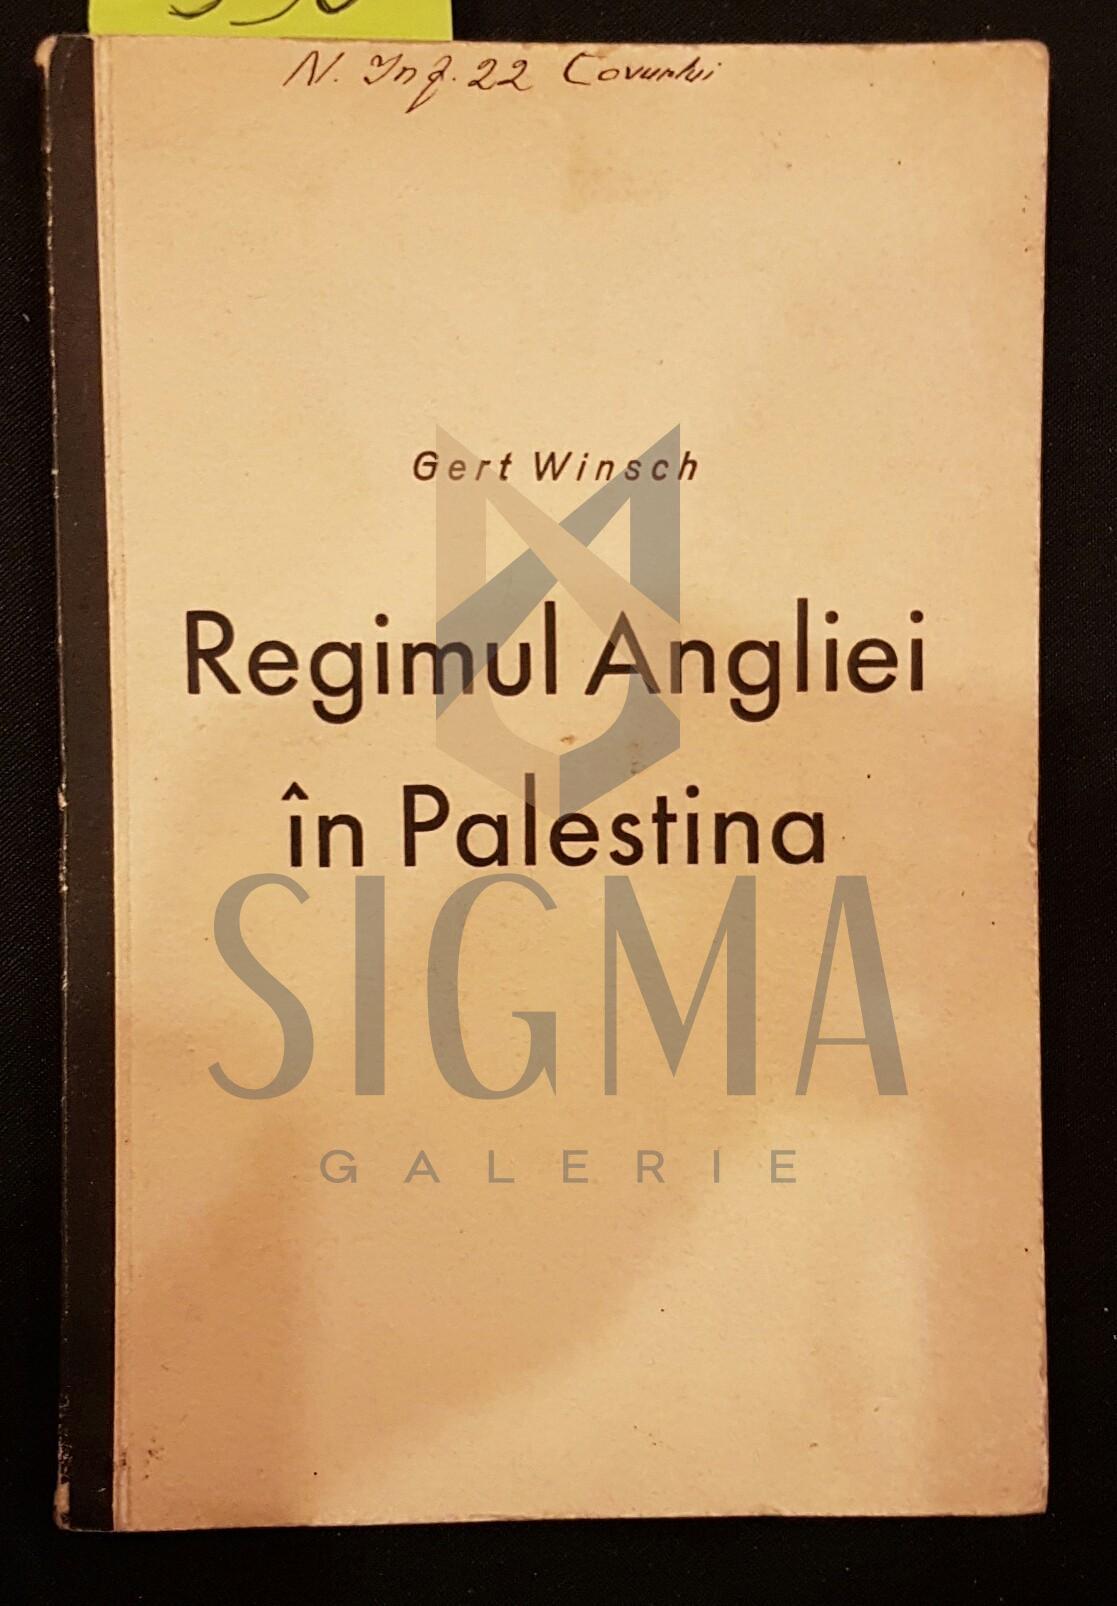 REGIMUL ANGLIEI IN PALESTINA -SERVICIUL GERMAN DE INFORMATII, BERLIN 1940